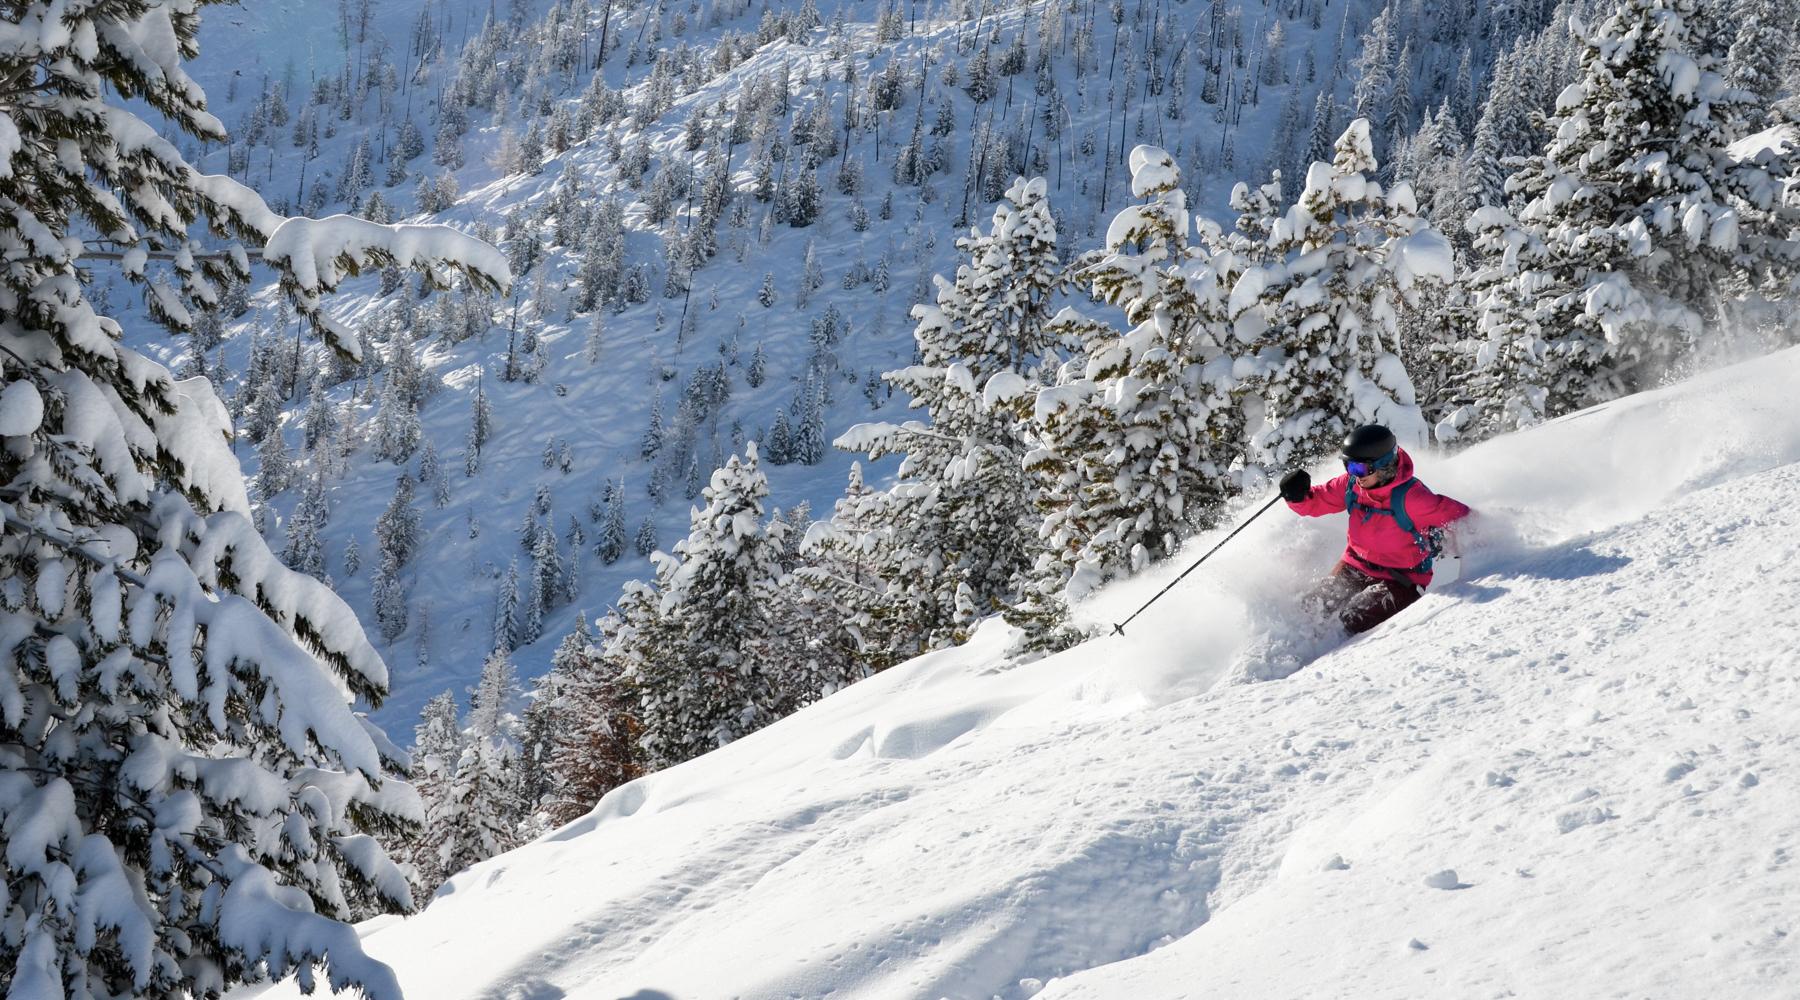 snow report & weather forecast - panorama mountain resort